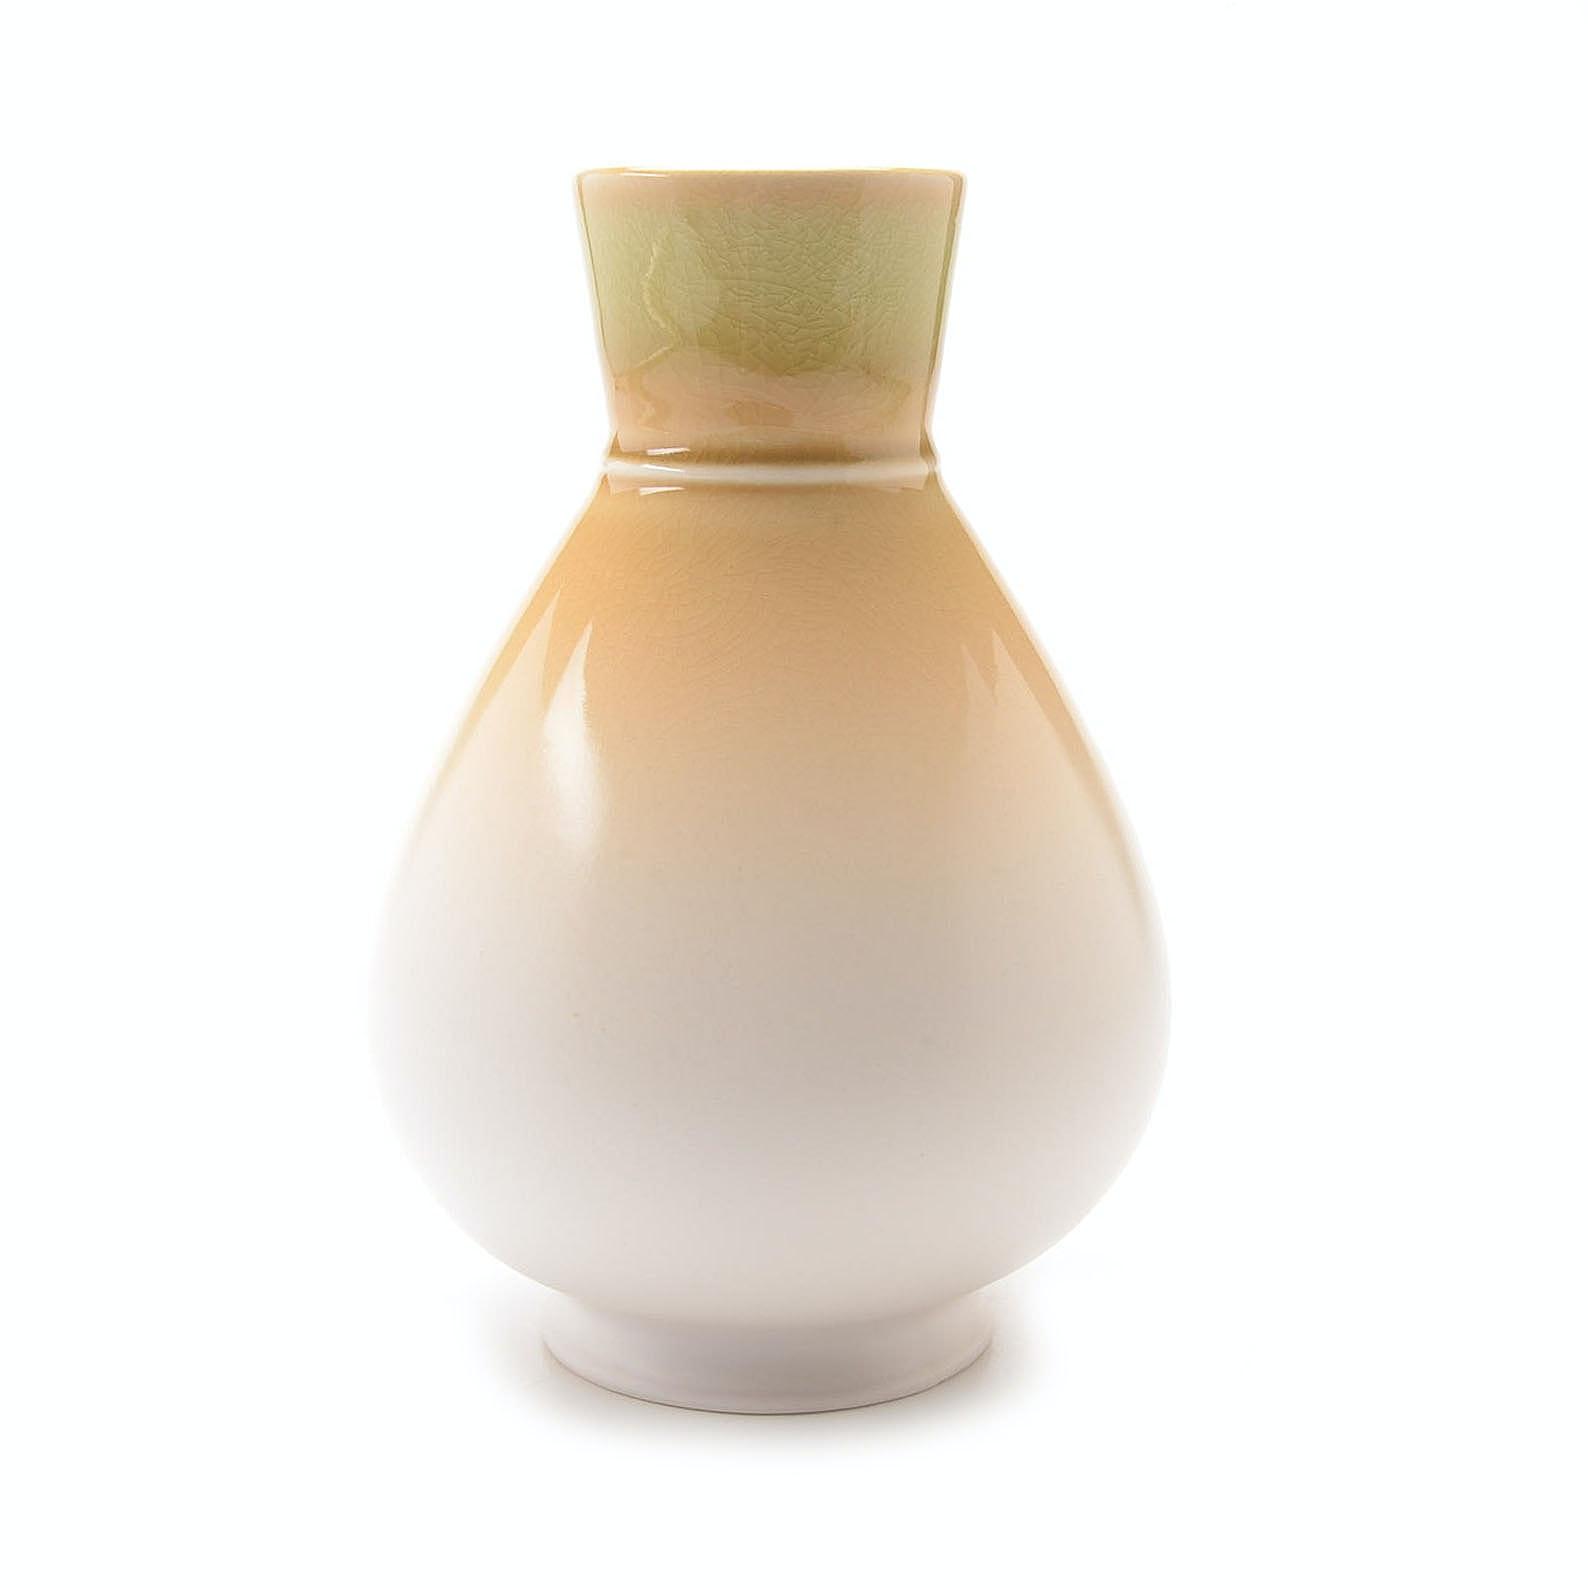 Rookwood Art Pottery Teardrop Vase